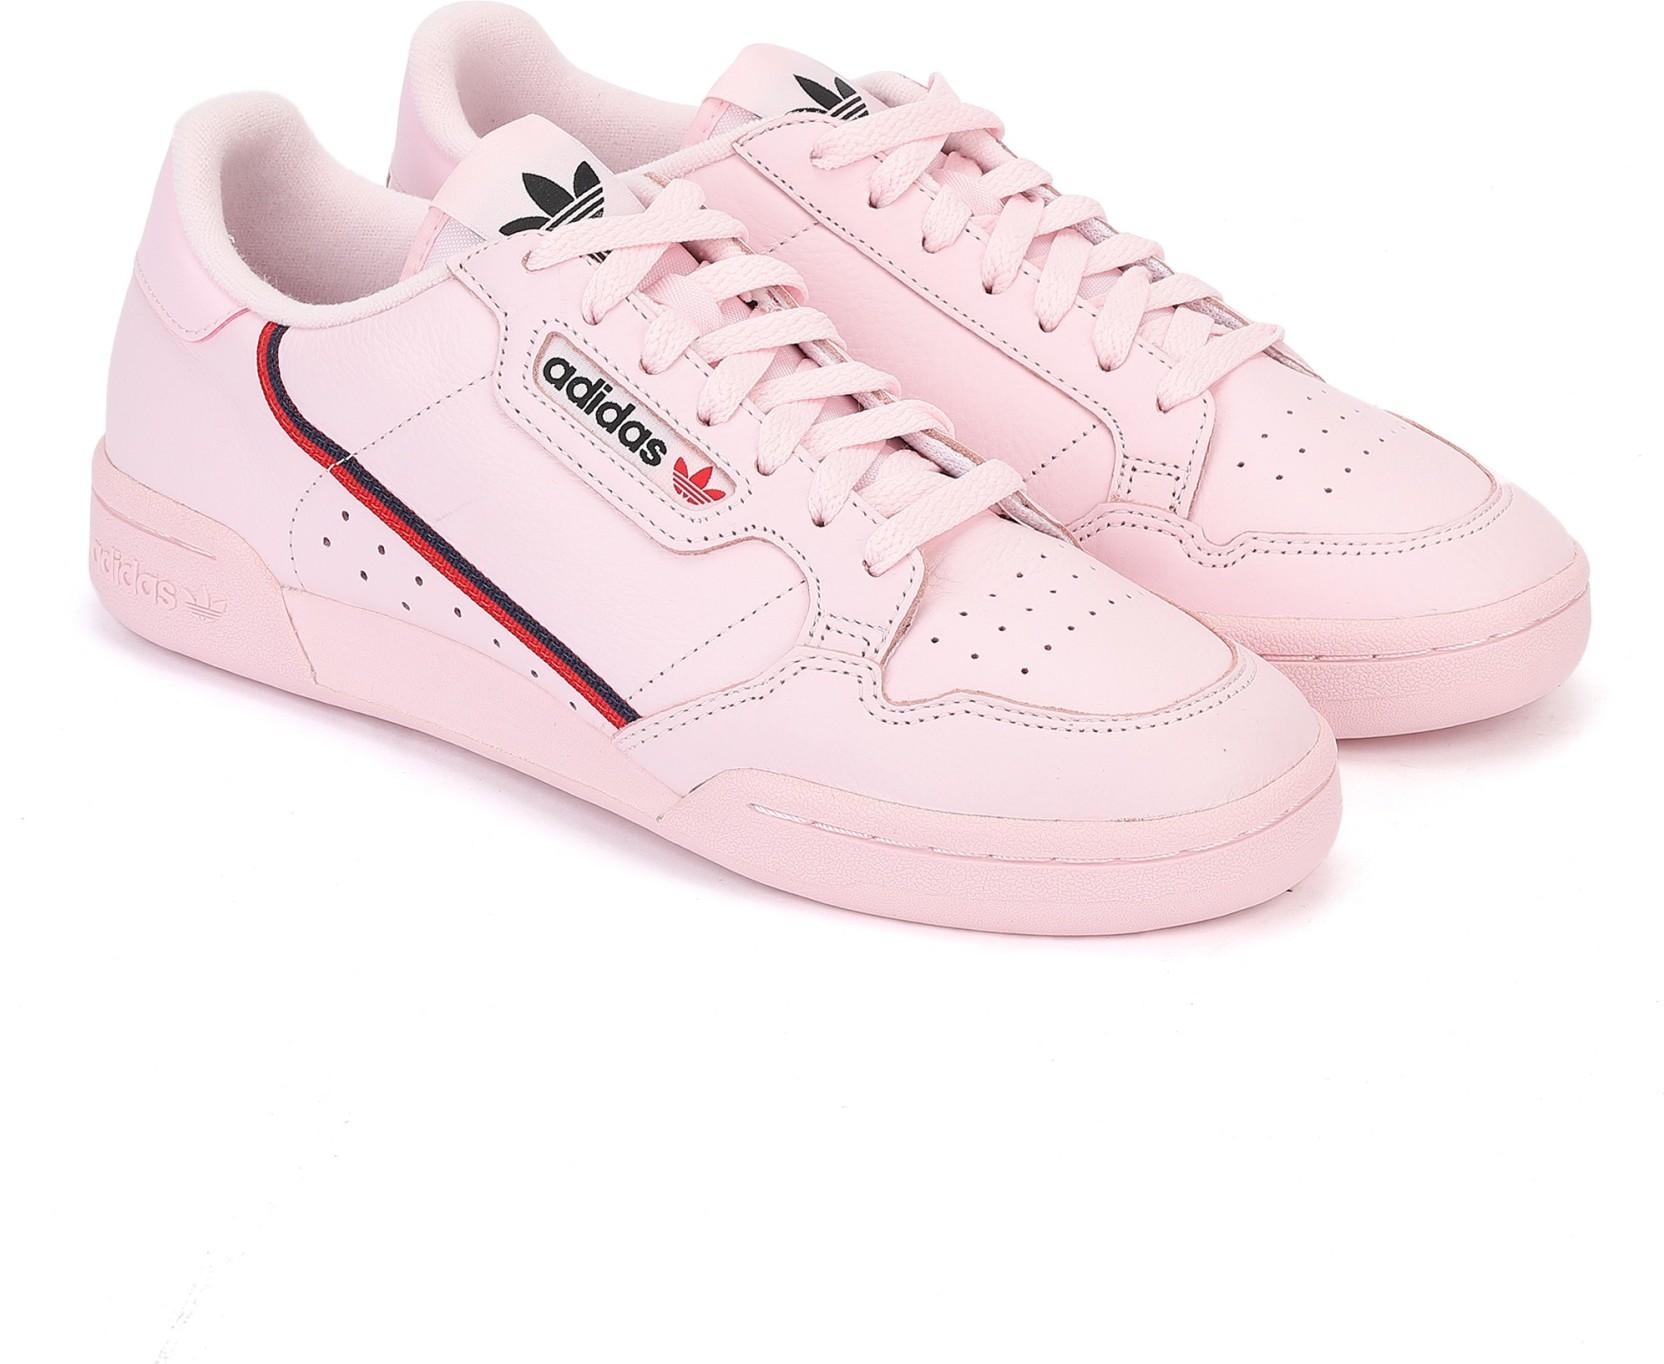 3120a60c974 ADIDAS ORIGINALS CONTINENTAL 80 Sneakers For Men - Buy ADIDAS ...